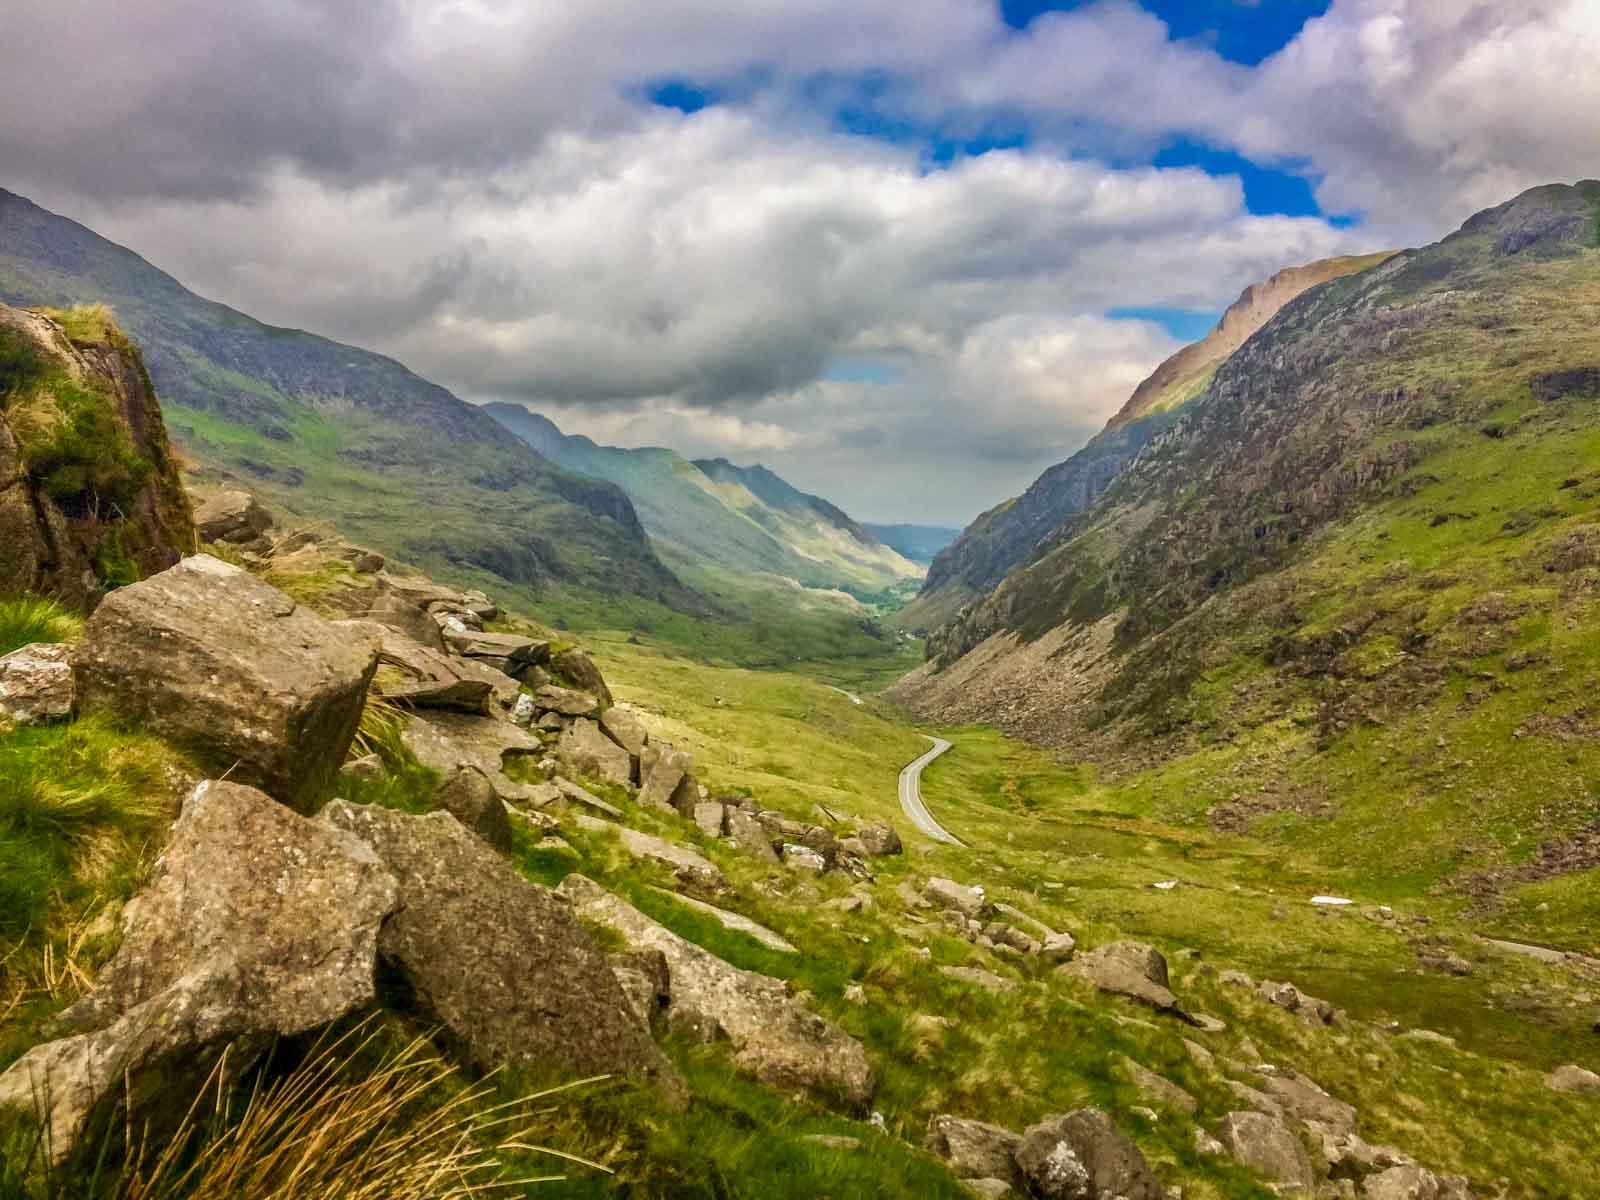 fullsizeoutput_12d0 Crib Goch - One of Britain's Greatest Ridges